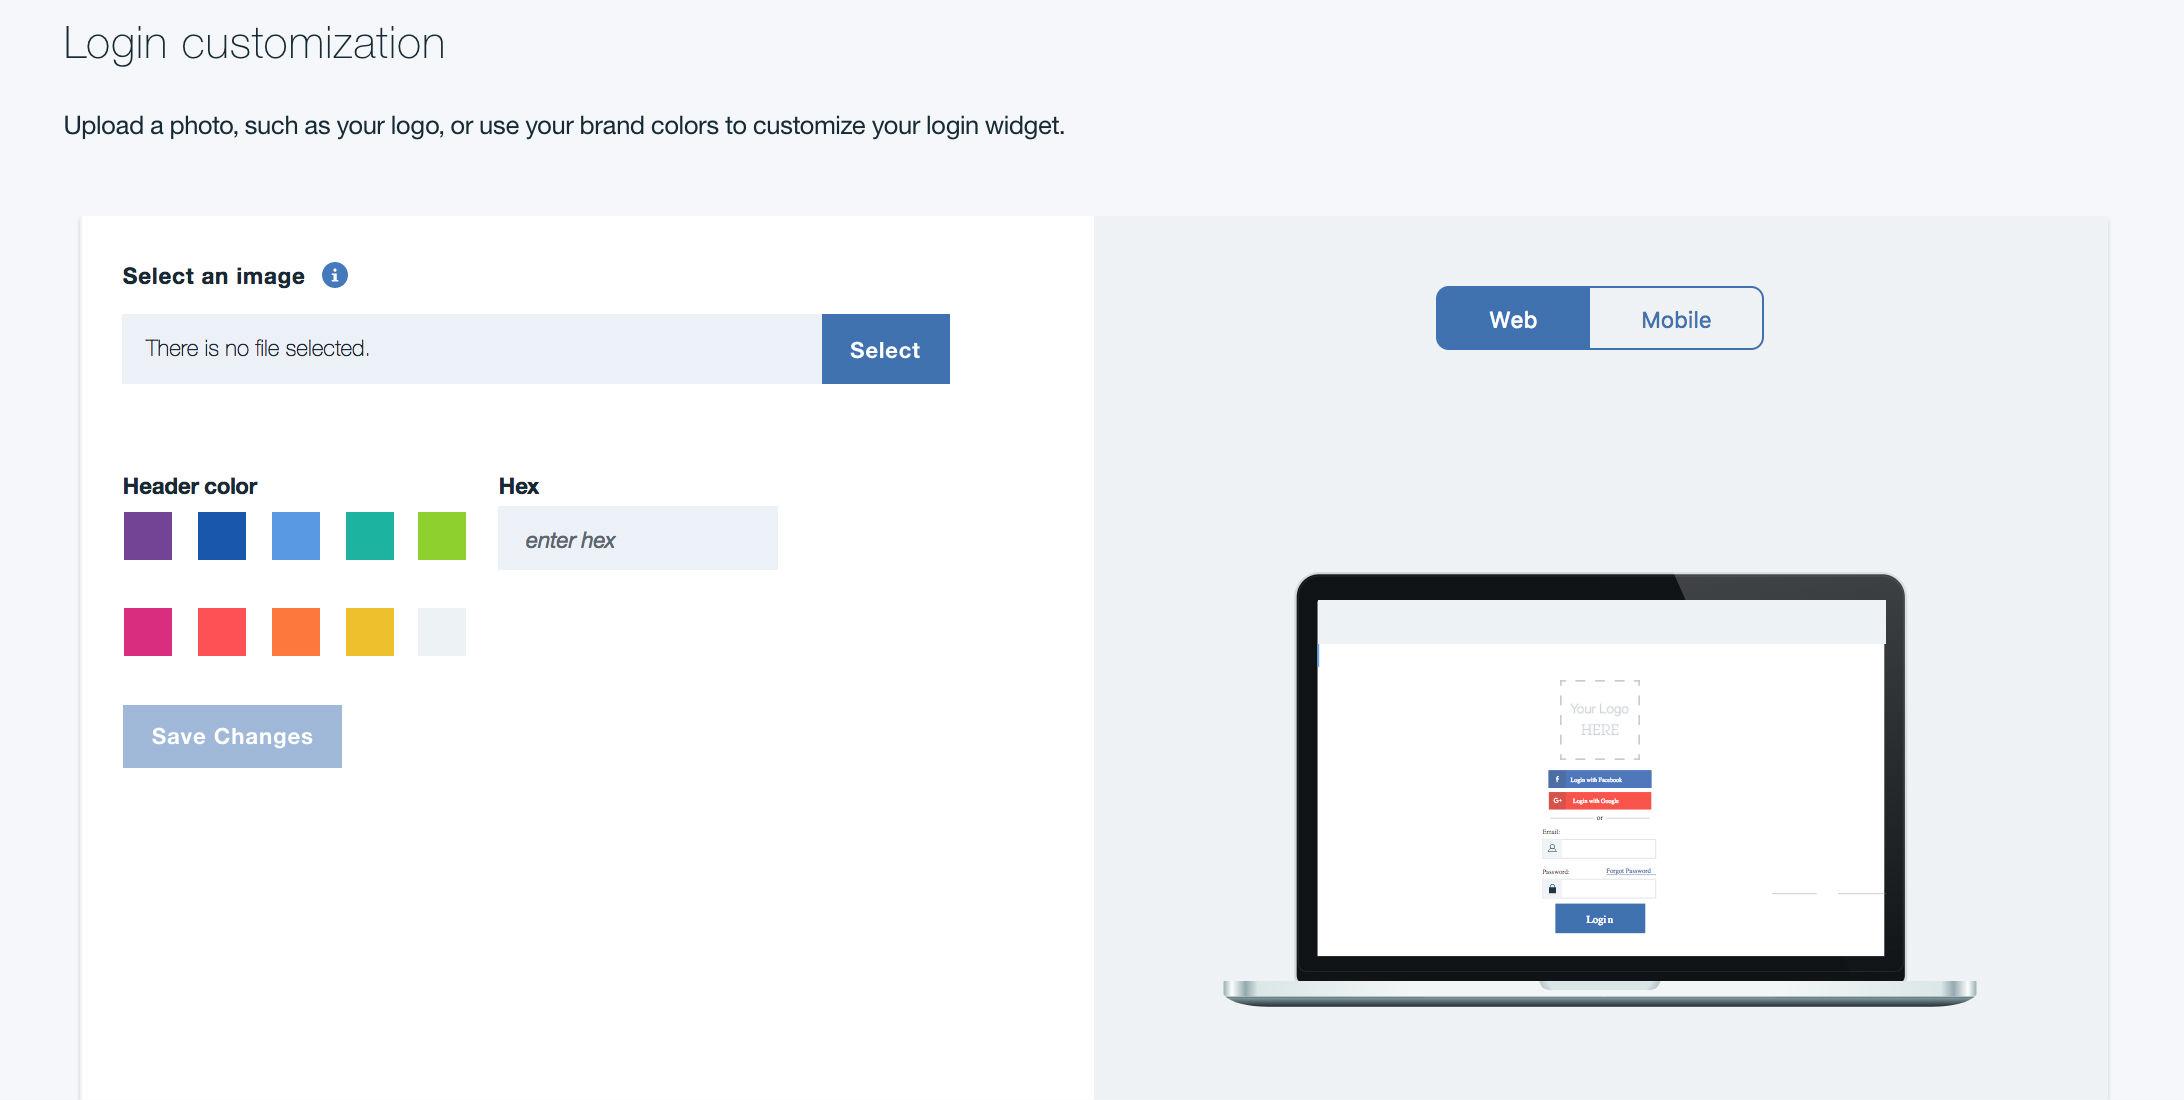 Customize your login screen